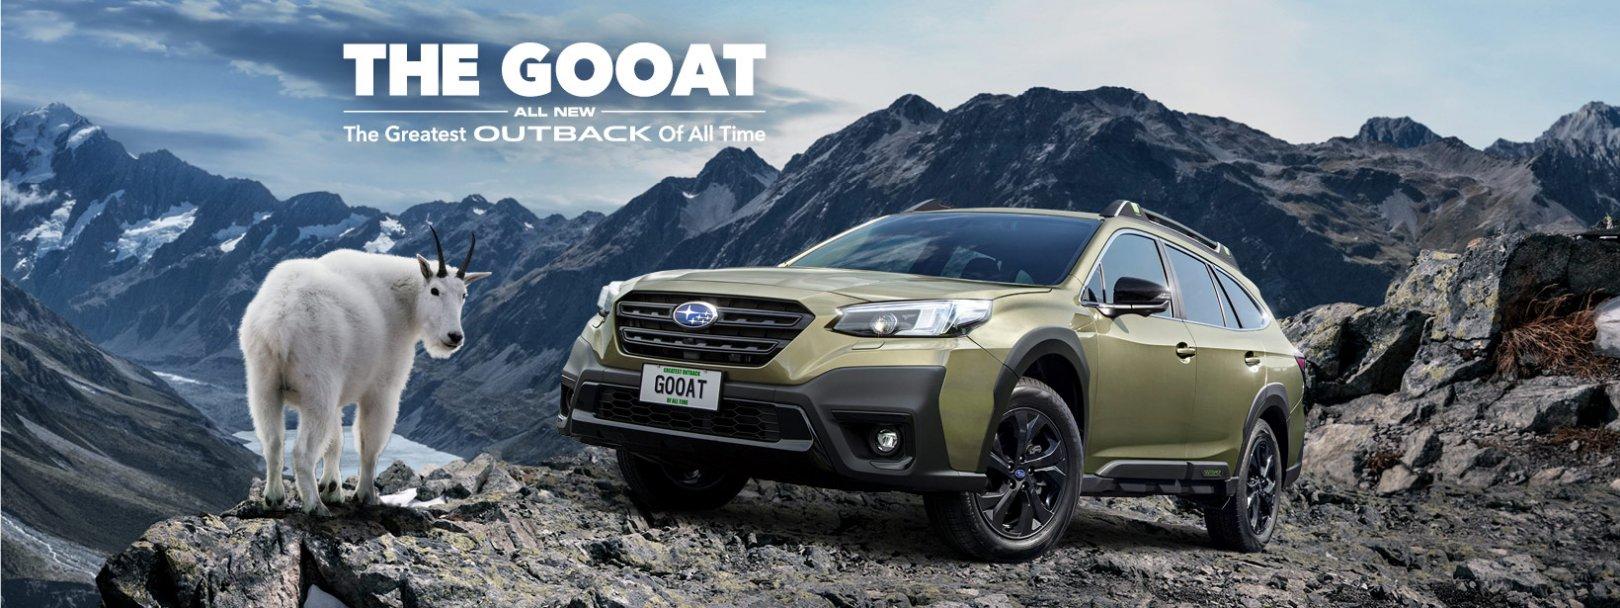 gooat-campaign-header